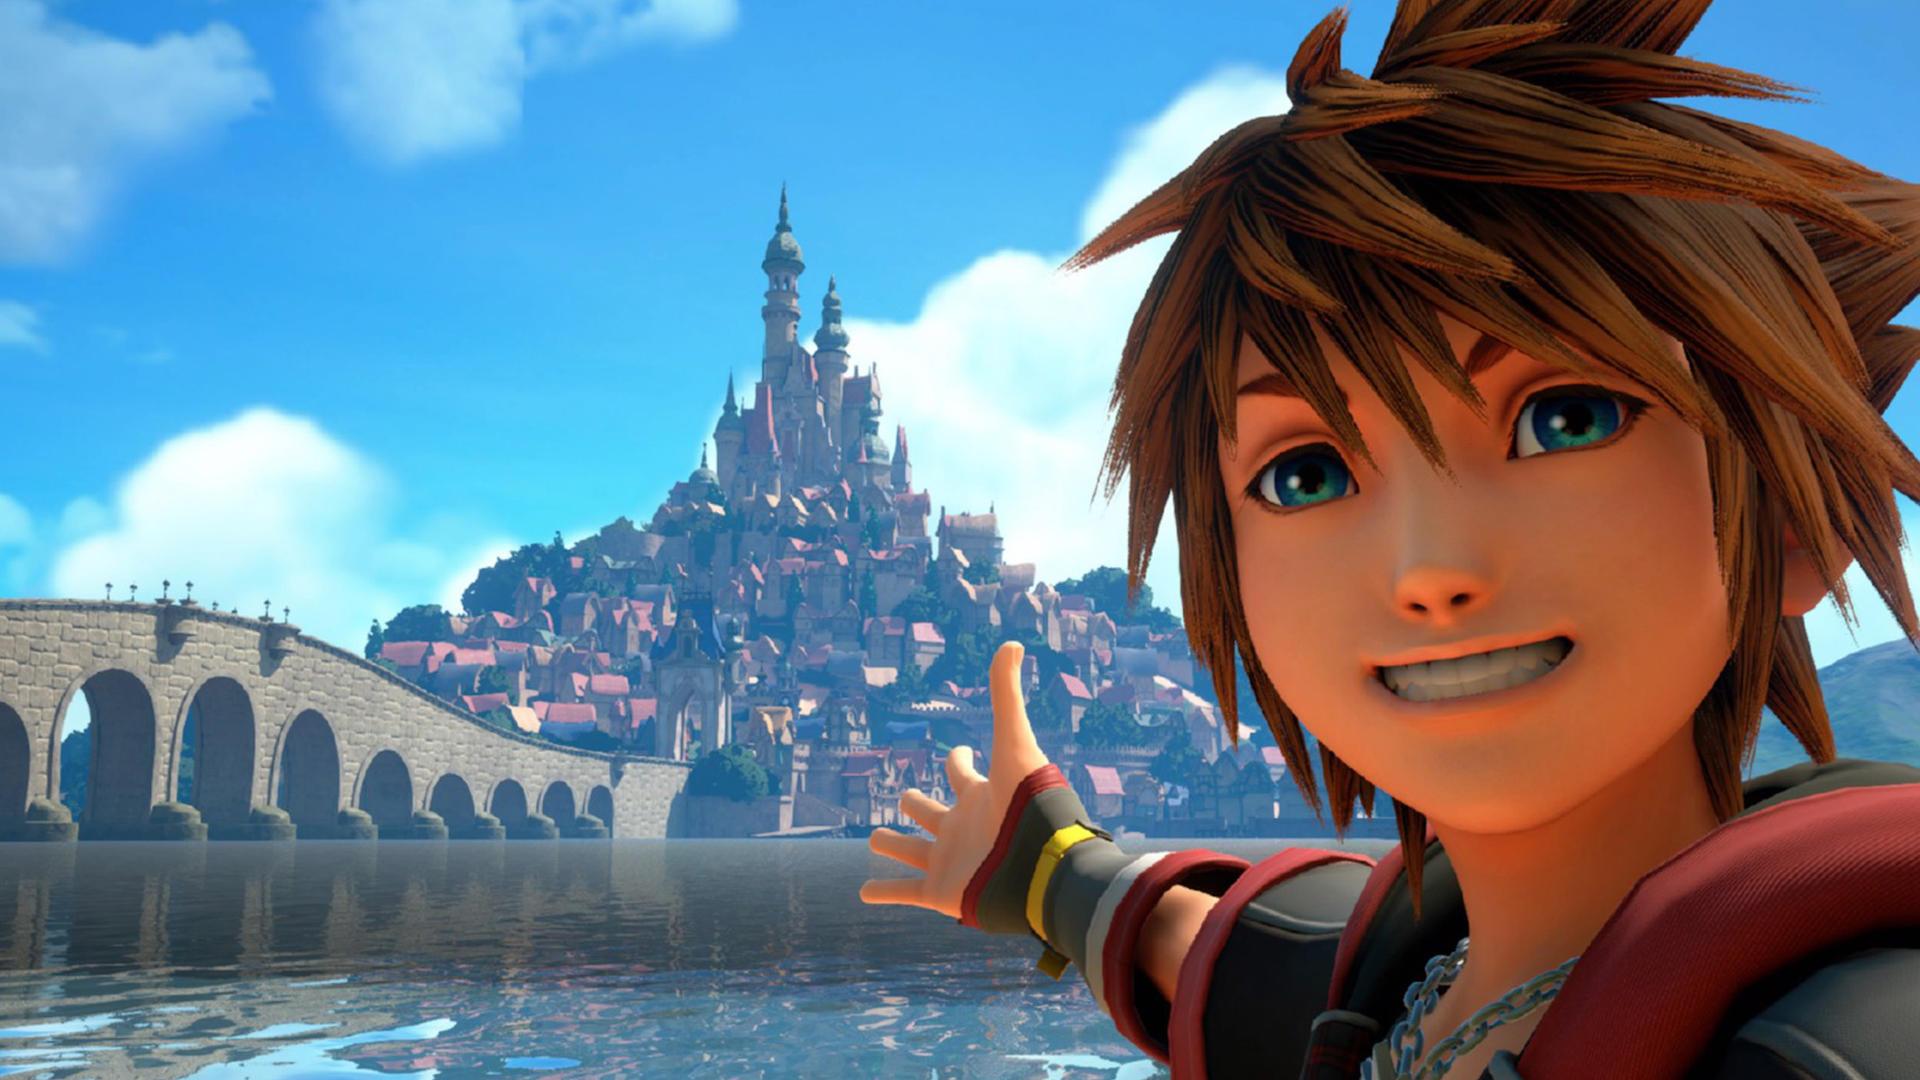 Yep, Kingdom Hearts III's ReMIND DLC is set for January 23 screenshot